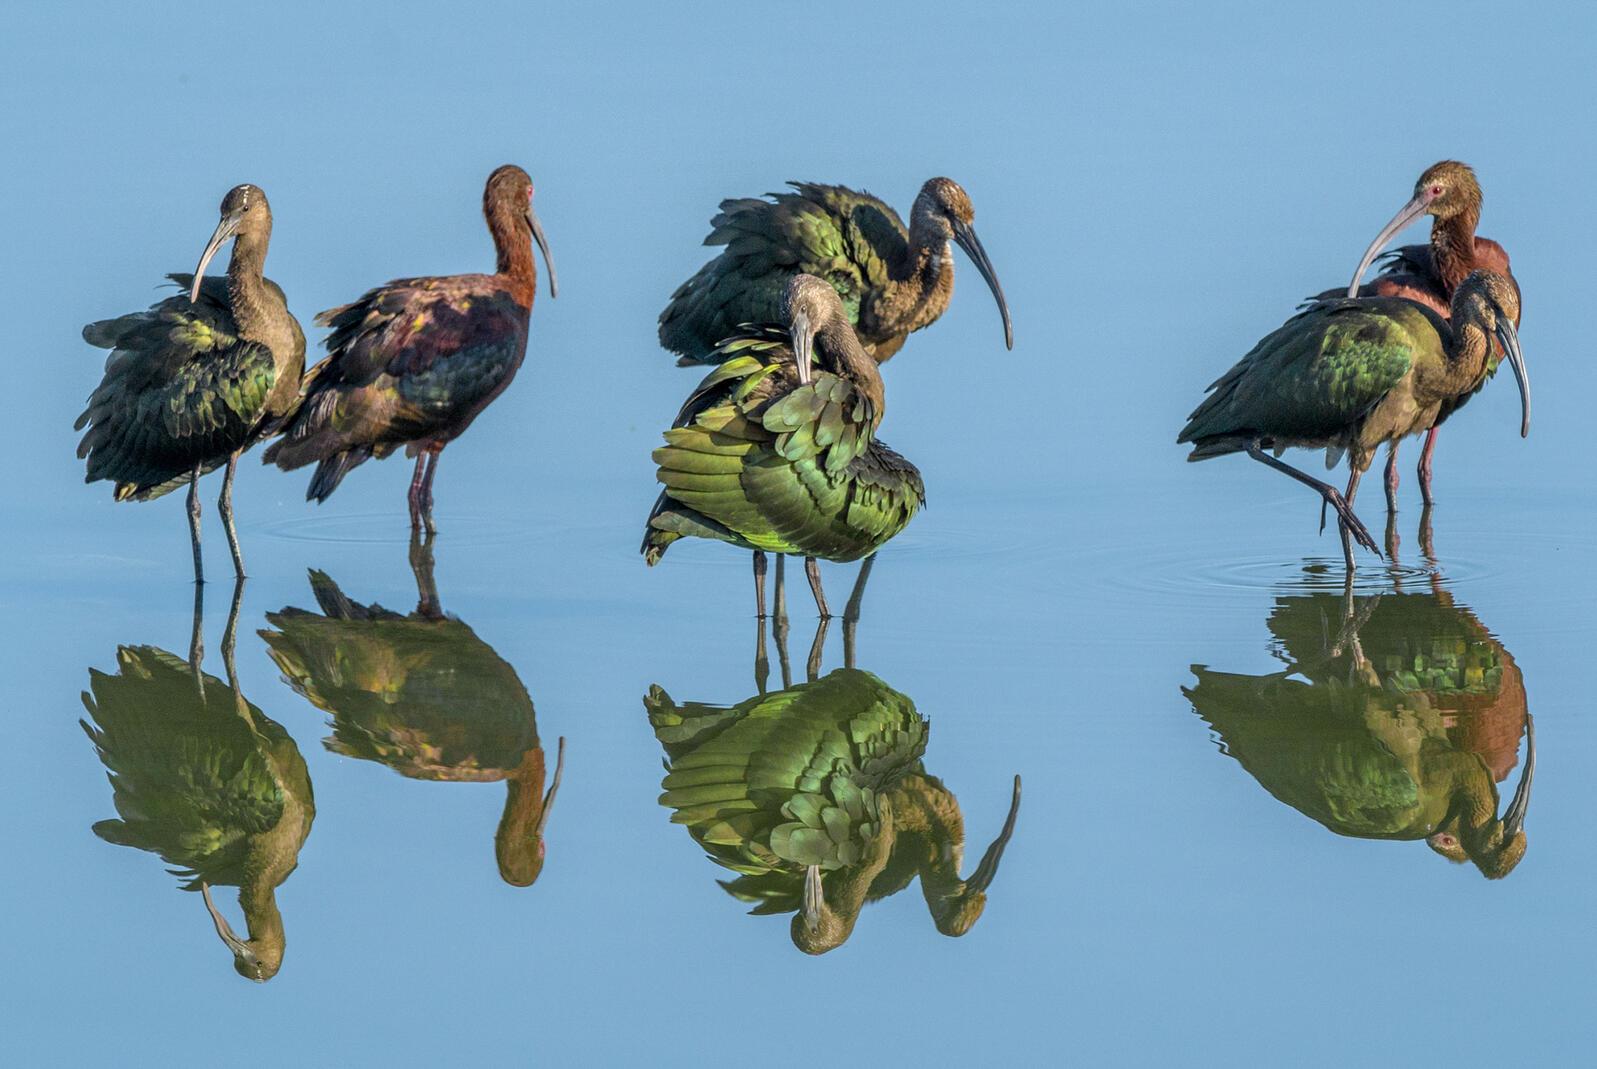 White-faced Ibis. Craig Goettsch/Audubon Photography Awards